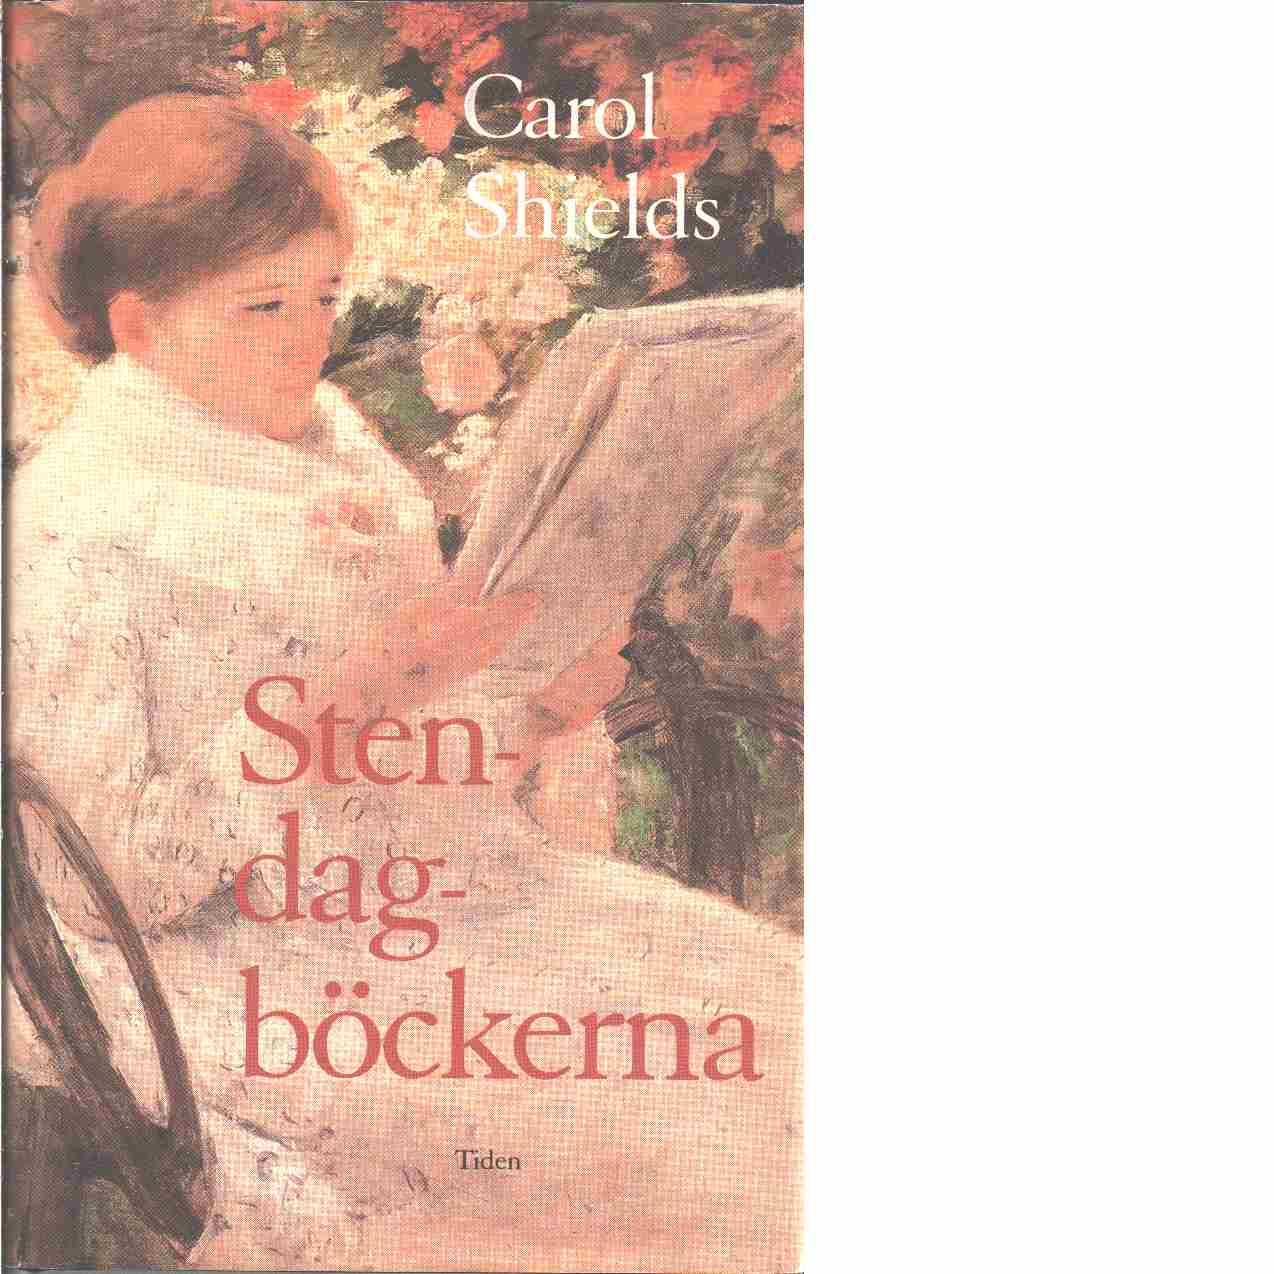 Stendagböckerna - Shields, Carol